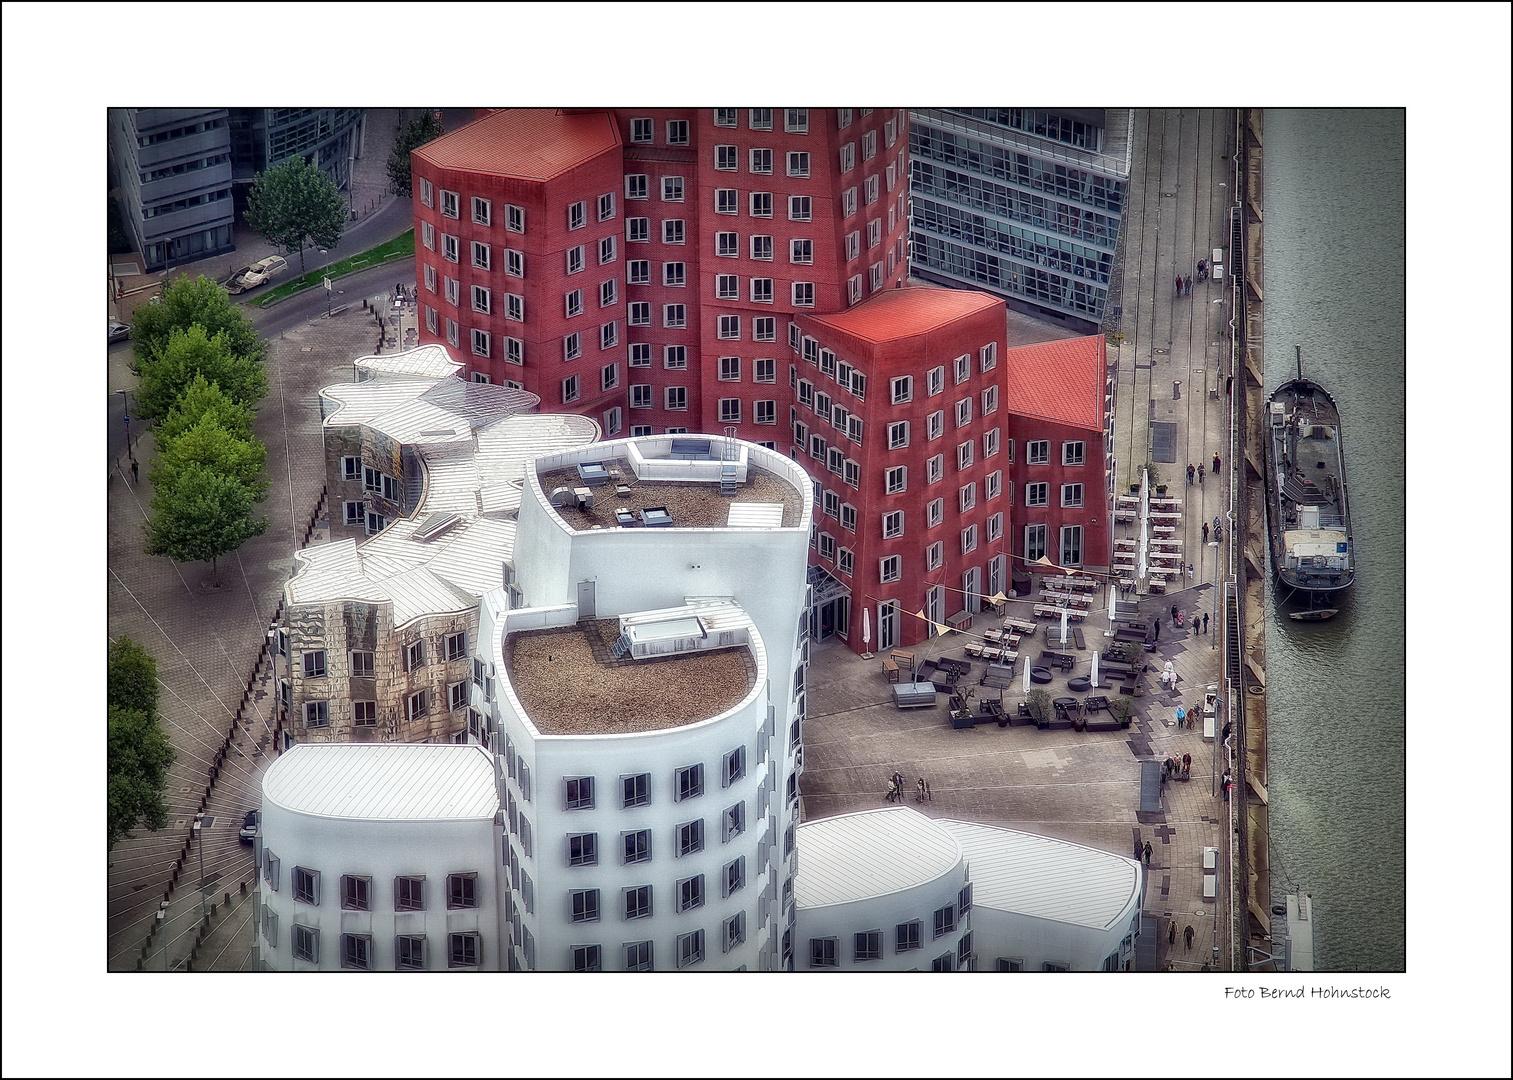 Düsseldorf Medienhafen  Gehry Bauten einmal anders ....